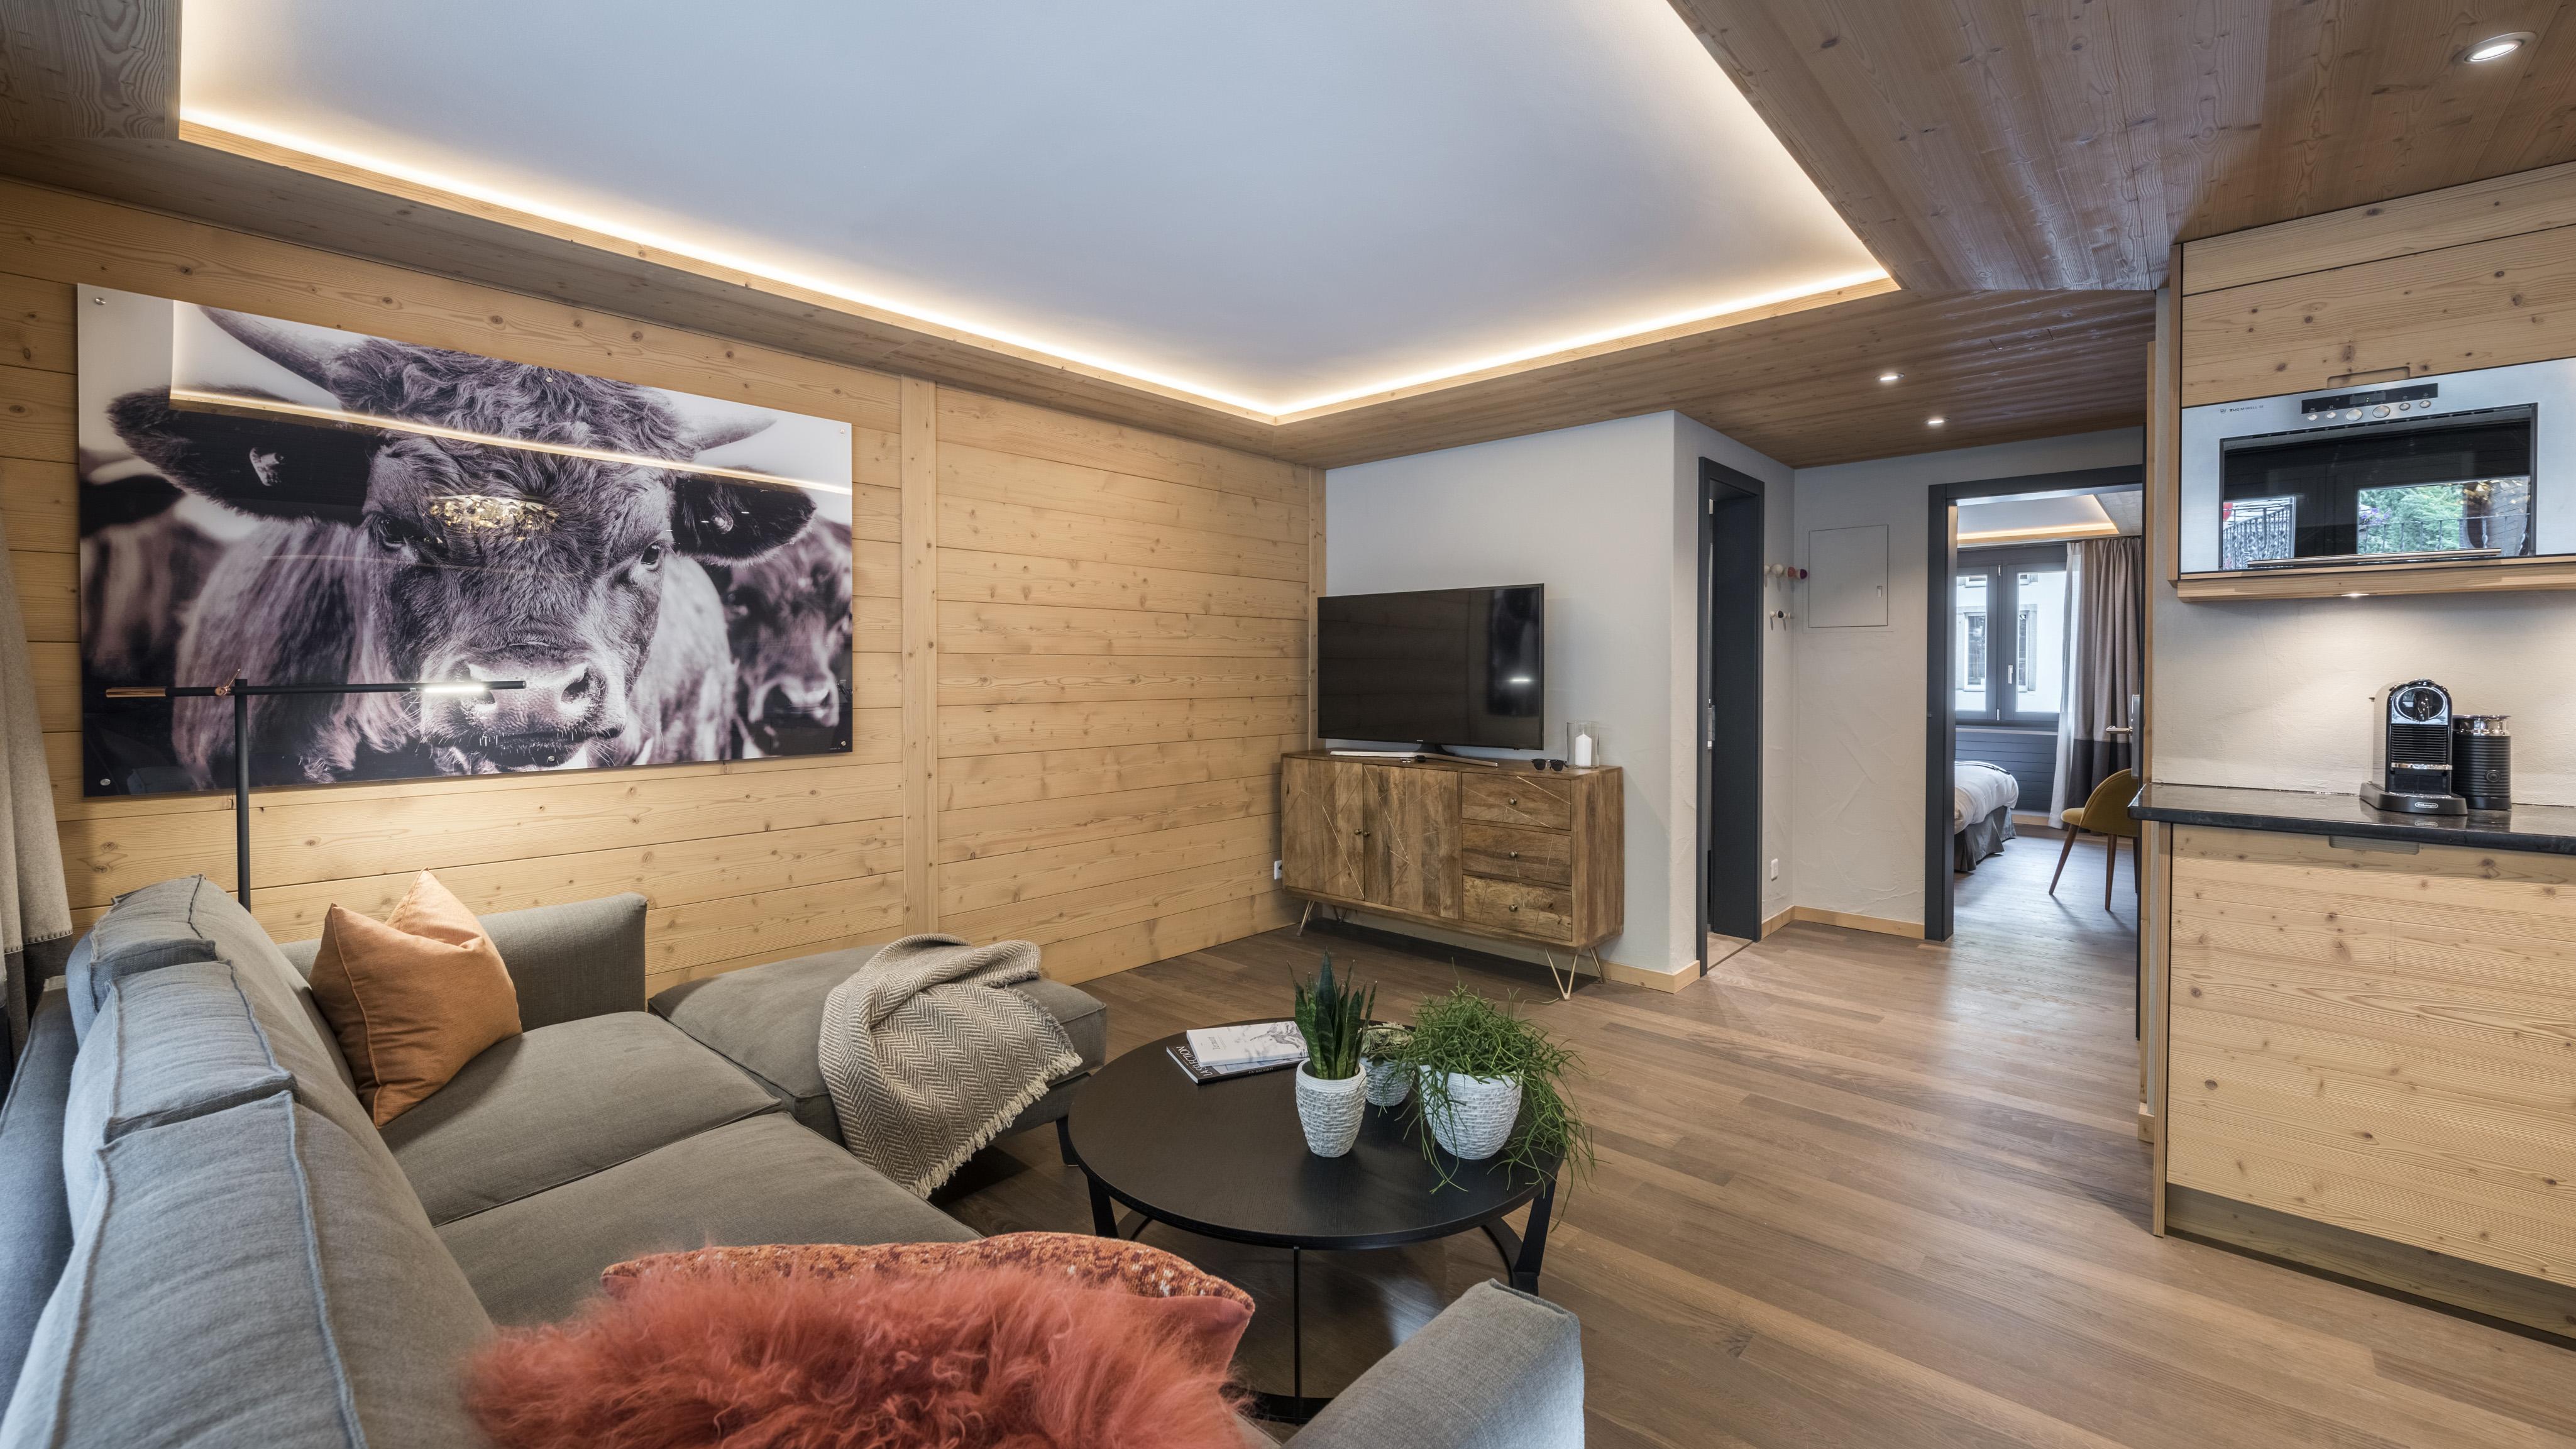 Nevada Apartments Apartments, Switzerland